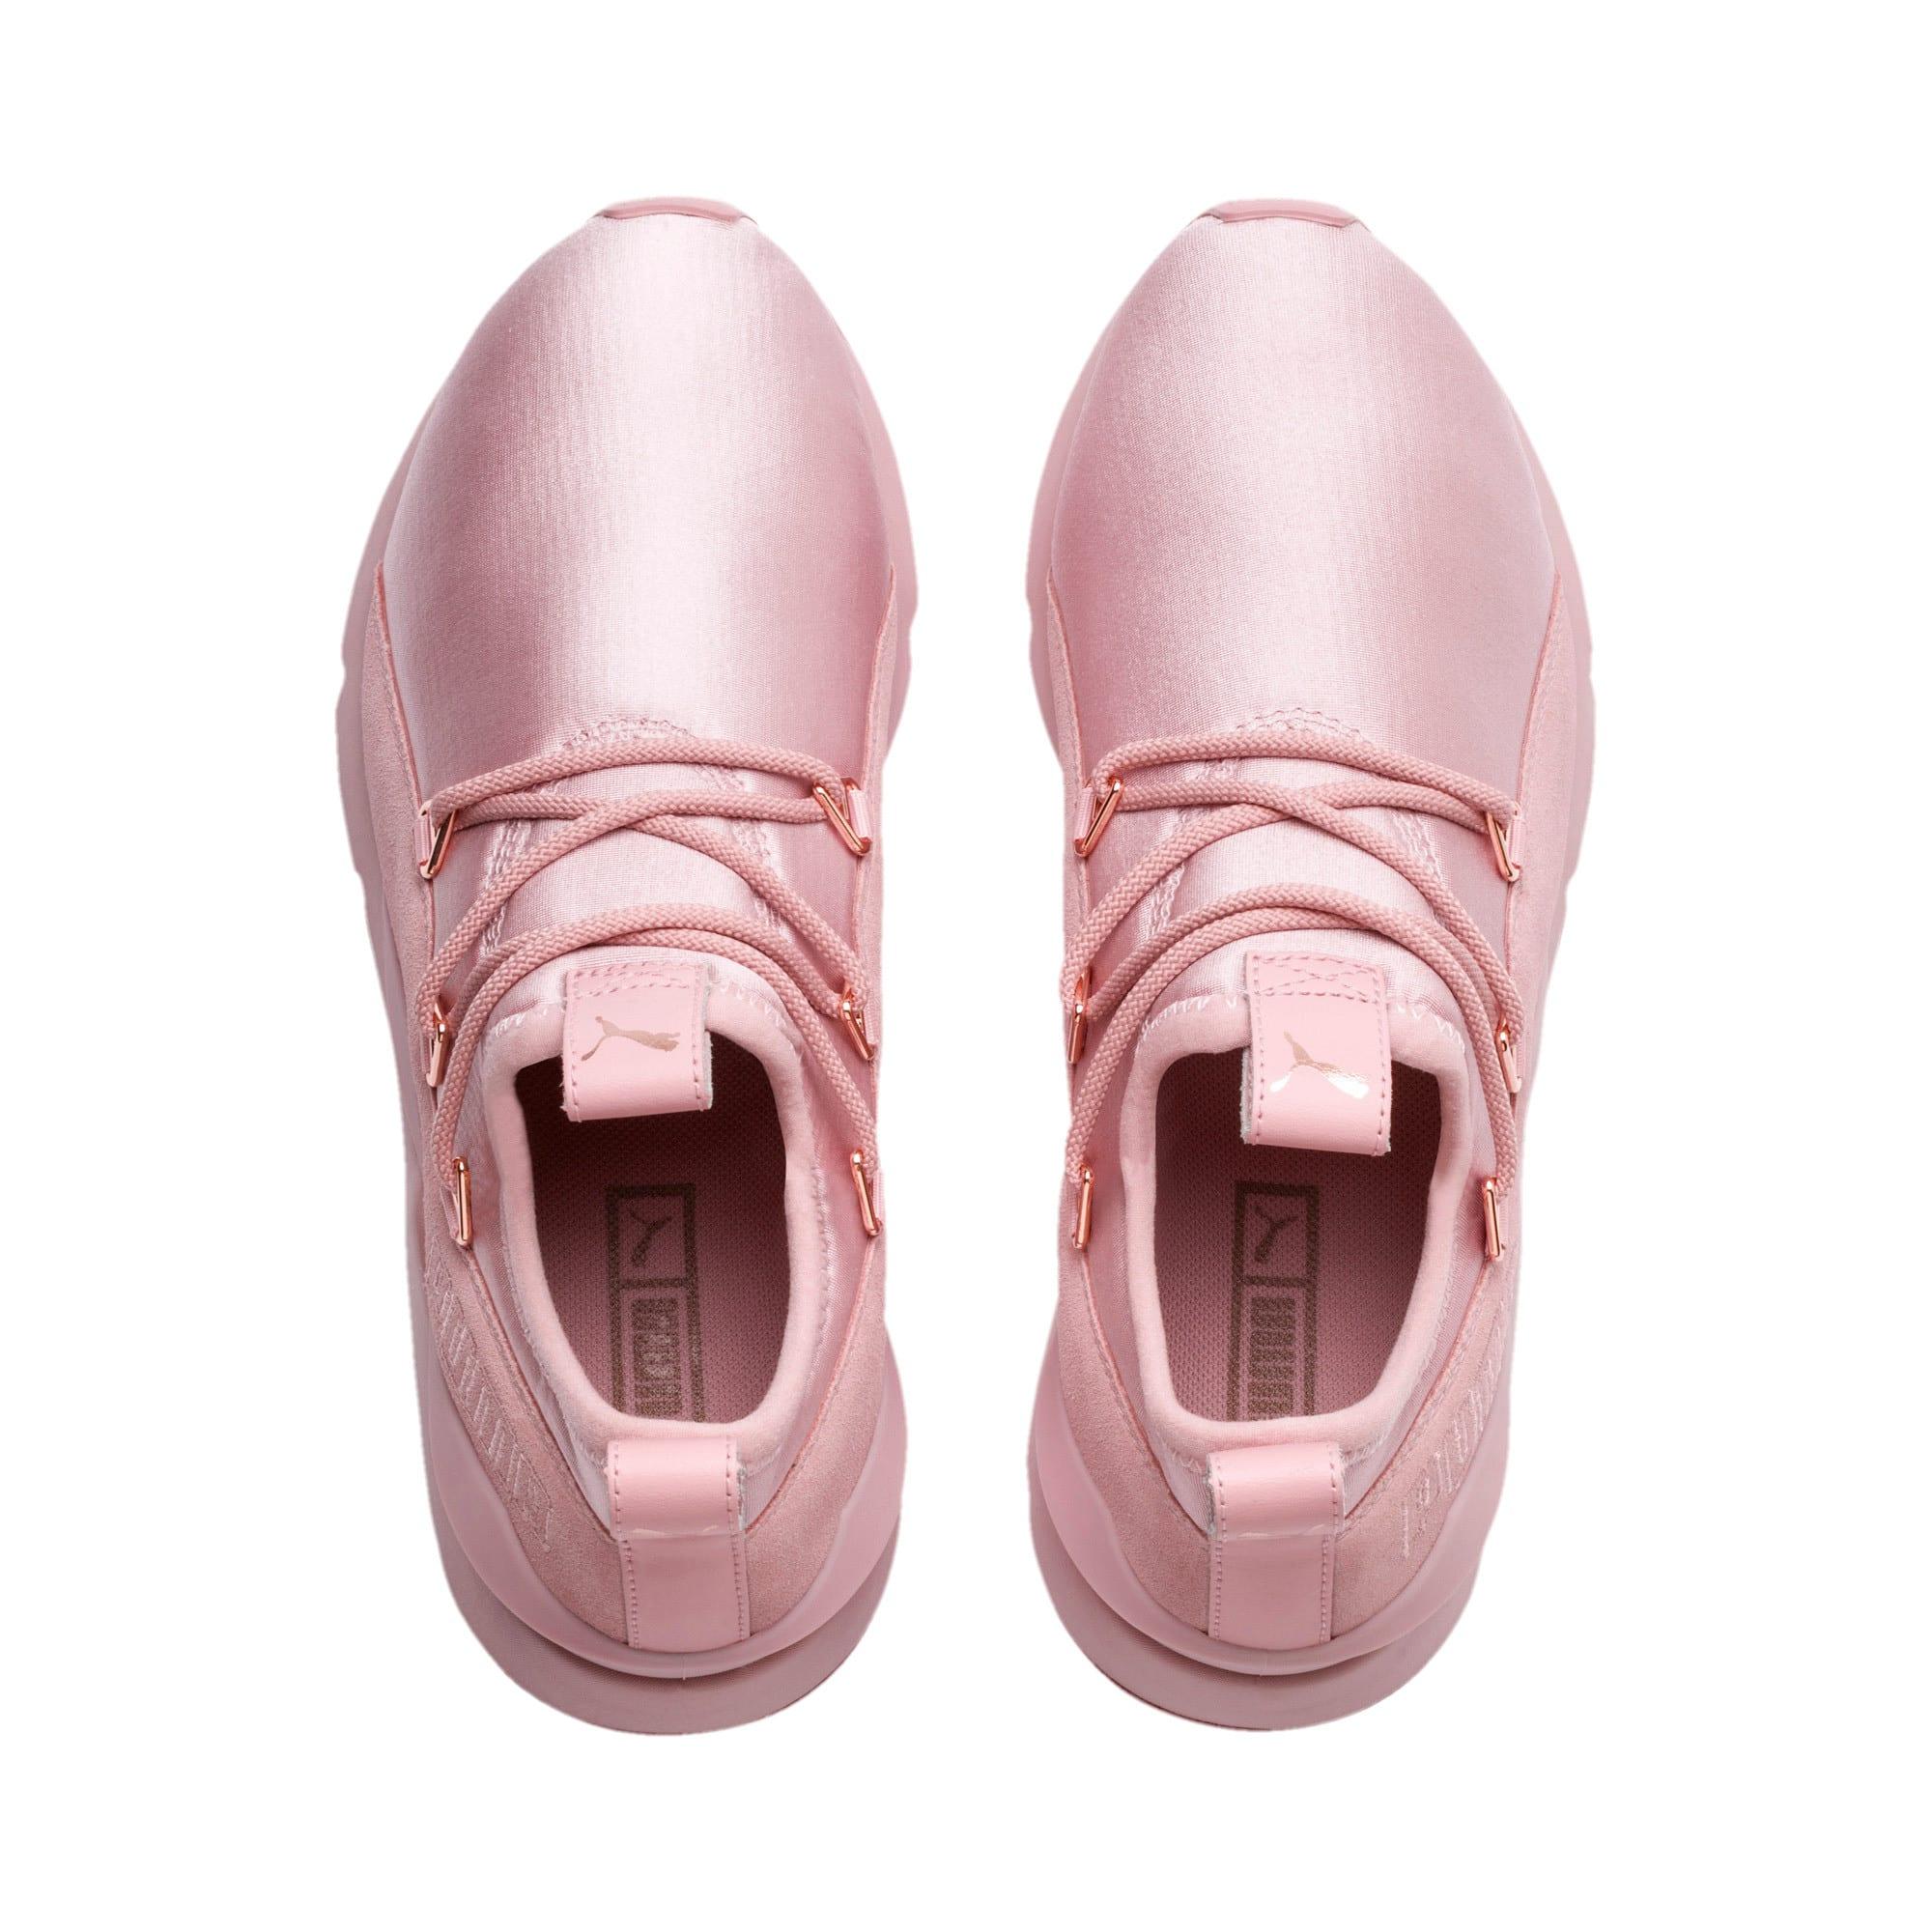 Miniatura 6 de Zapatos deportivos Muse 2 para mujer, Bridal Rose-Bridal Rose, mediano